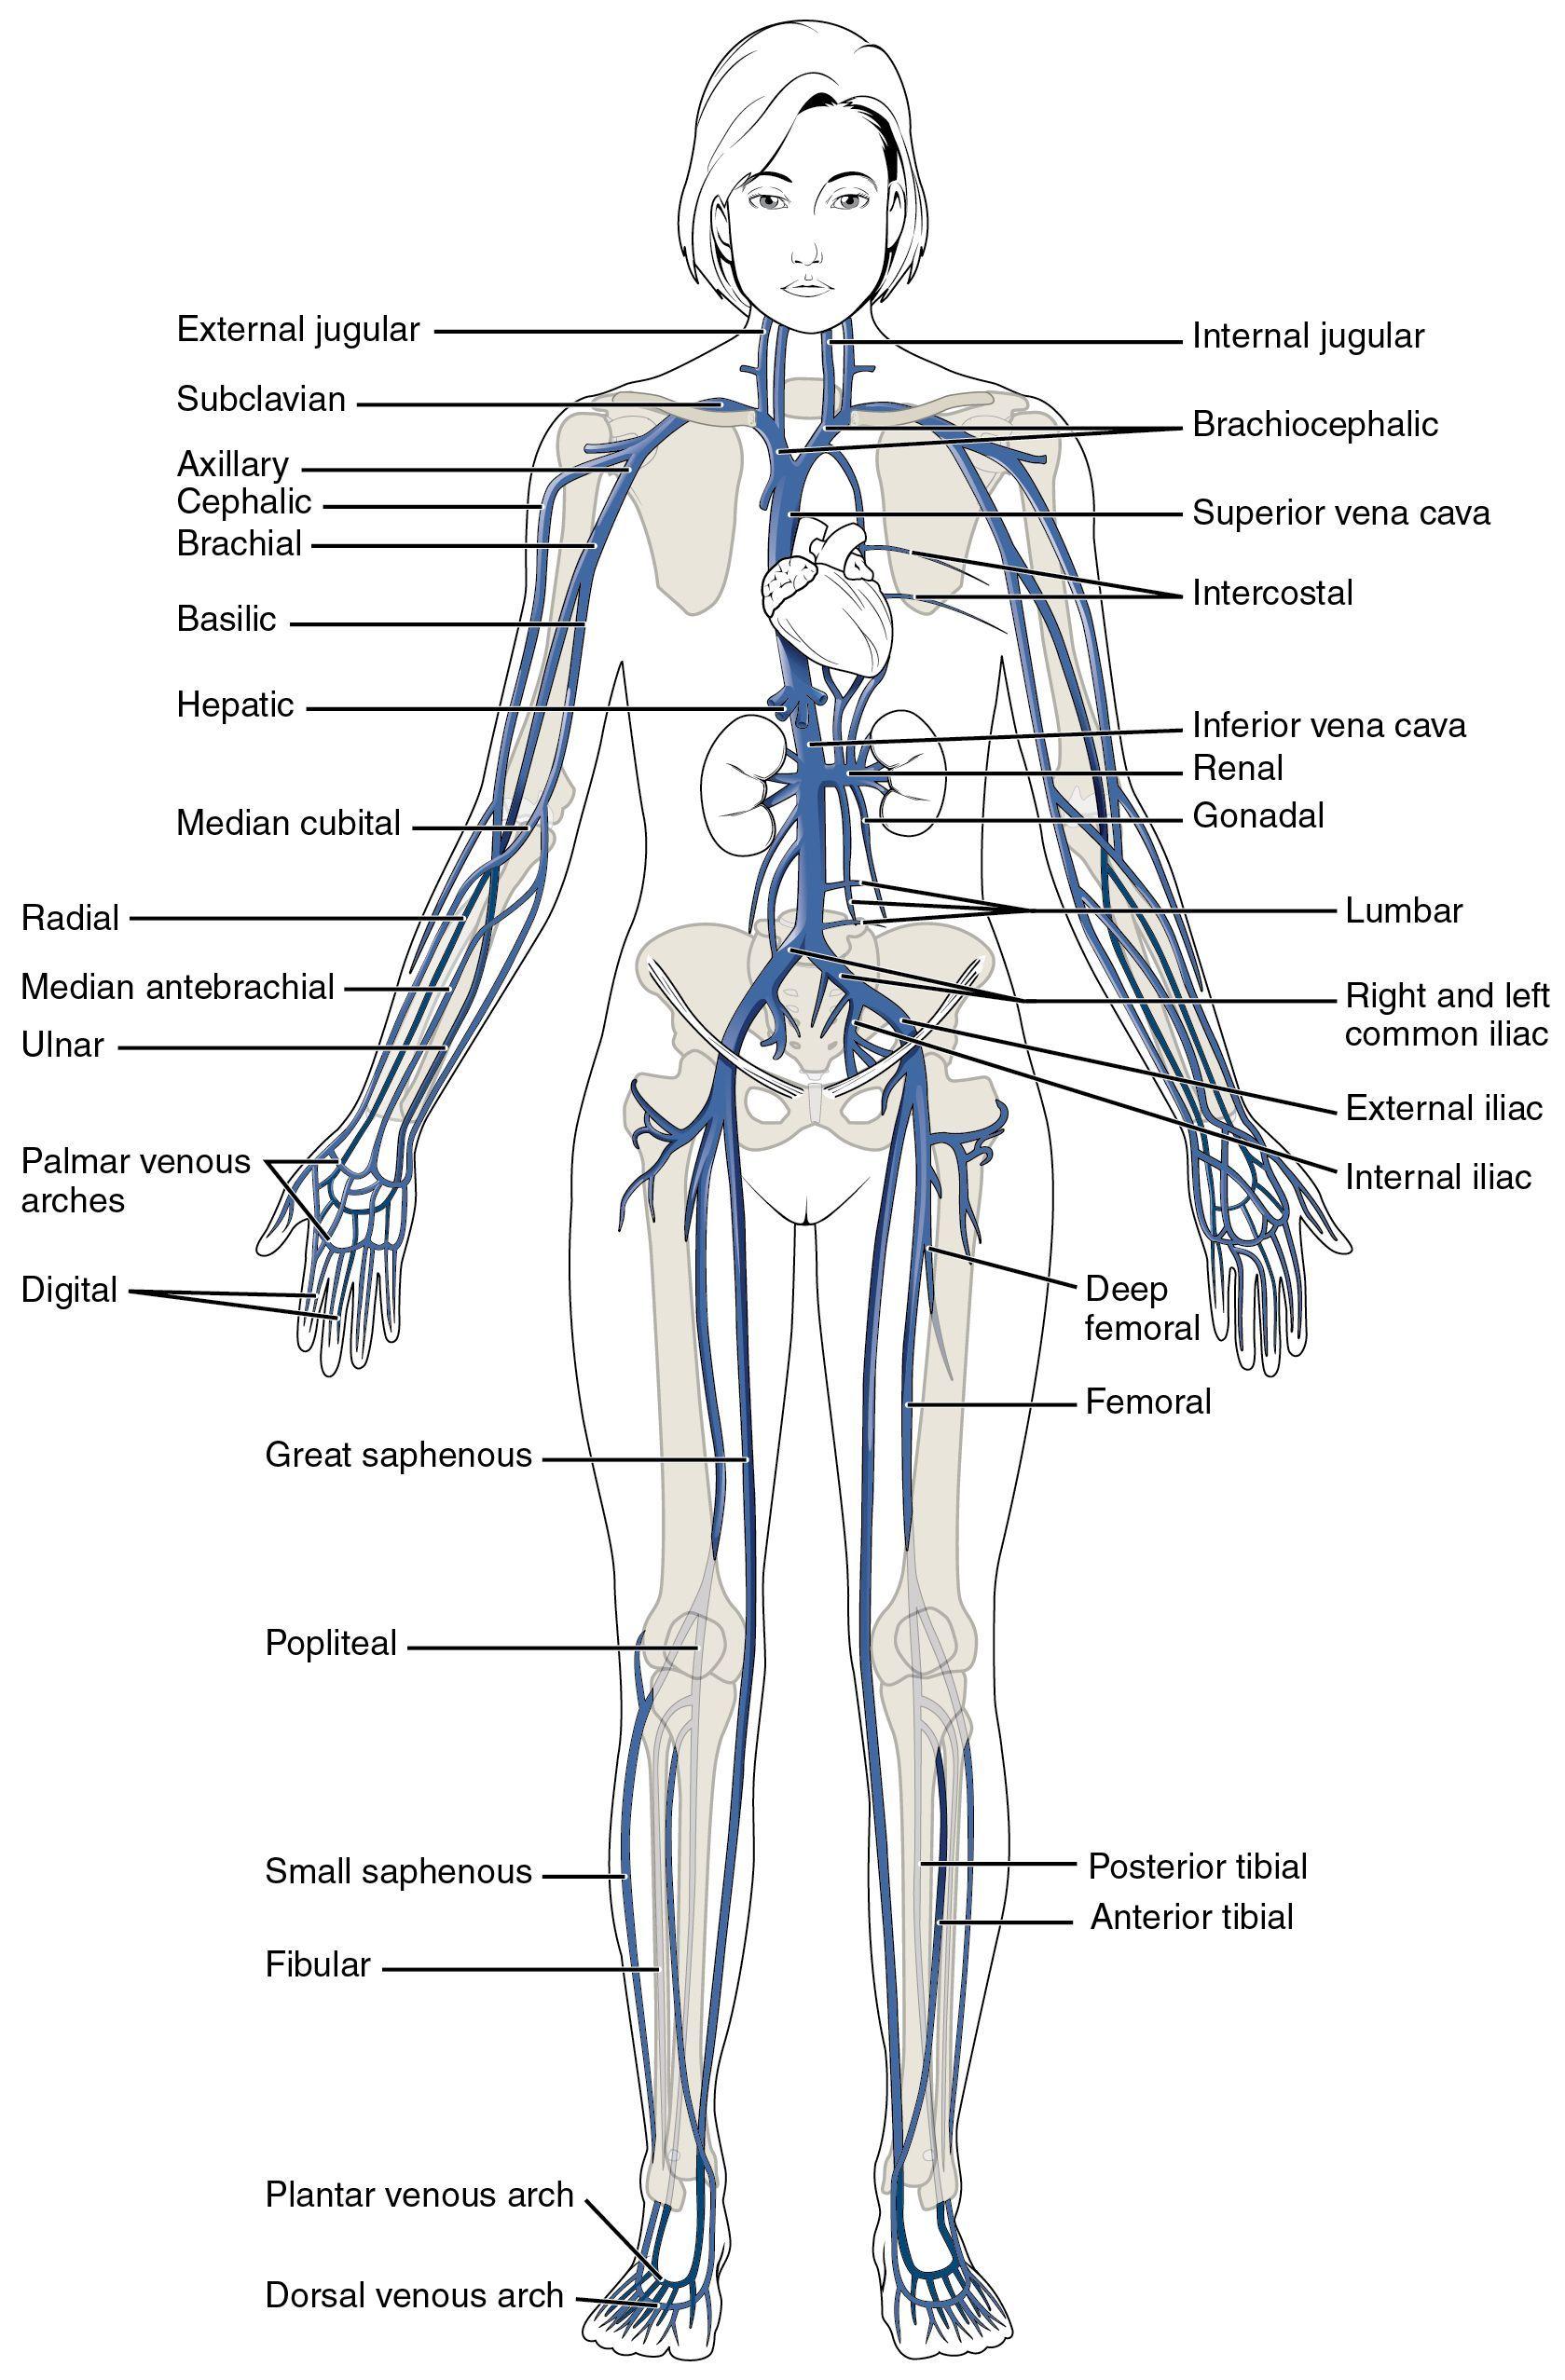 Bones Body Diagram Unlabeled Fuse Box Wiring Diagram